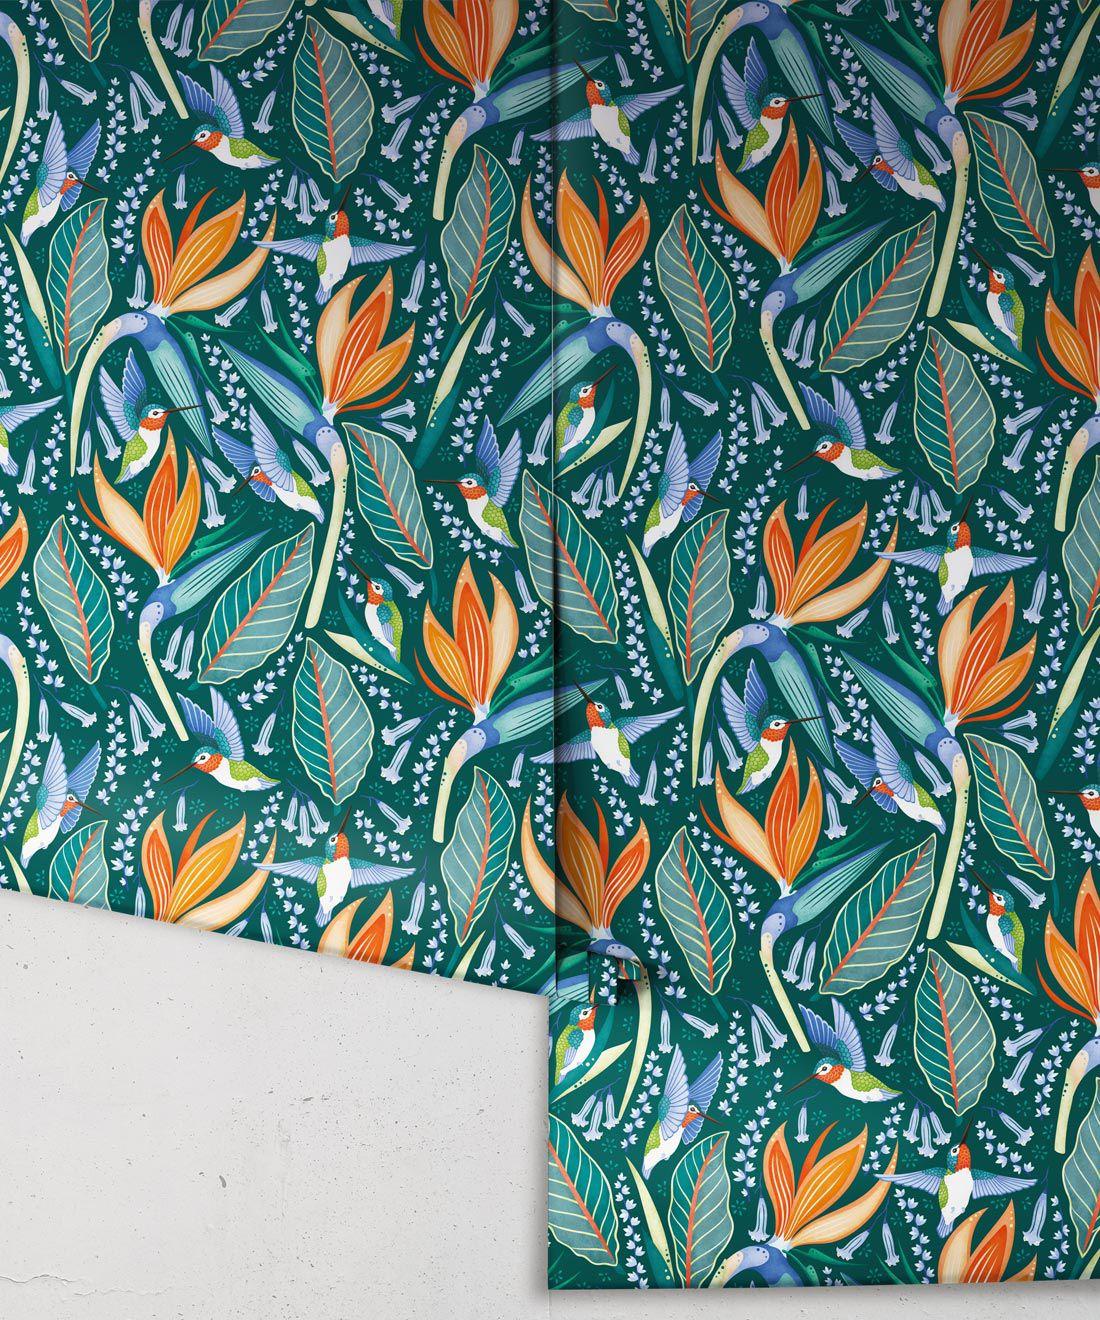 Hummingbird Wallpaper • Birds Of Paradise Flower • Bird Wallpaper • Green Wallpaper